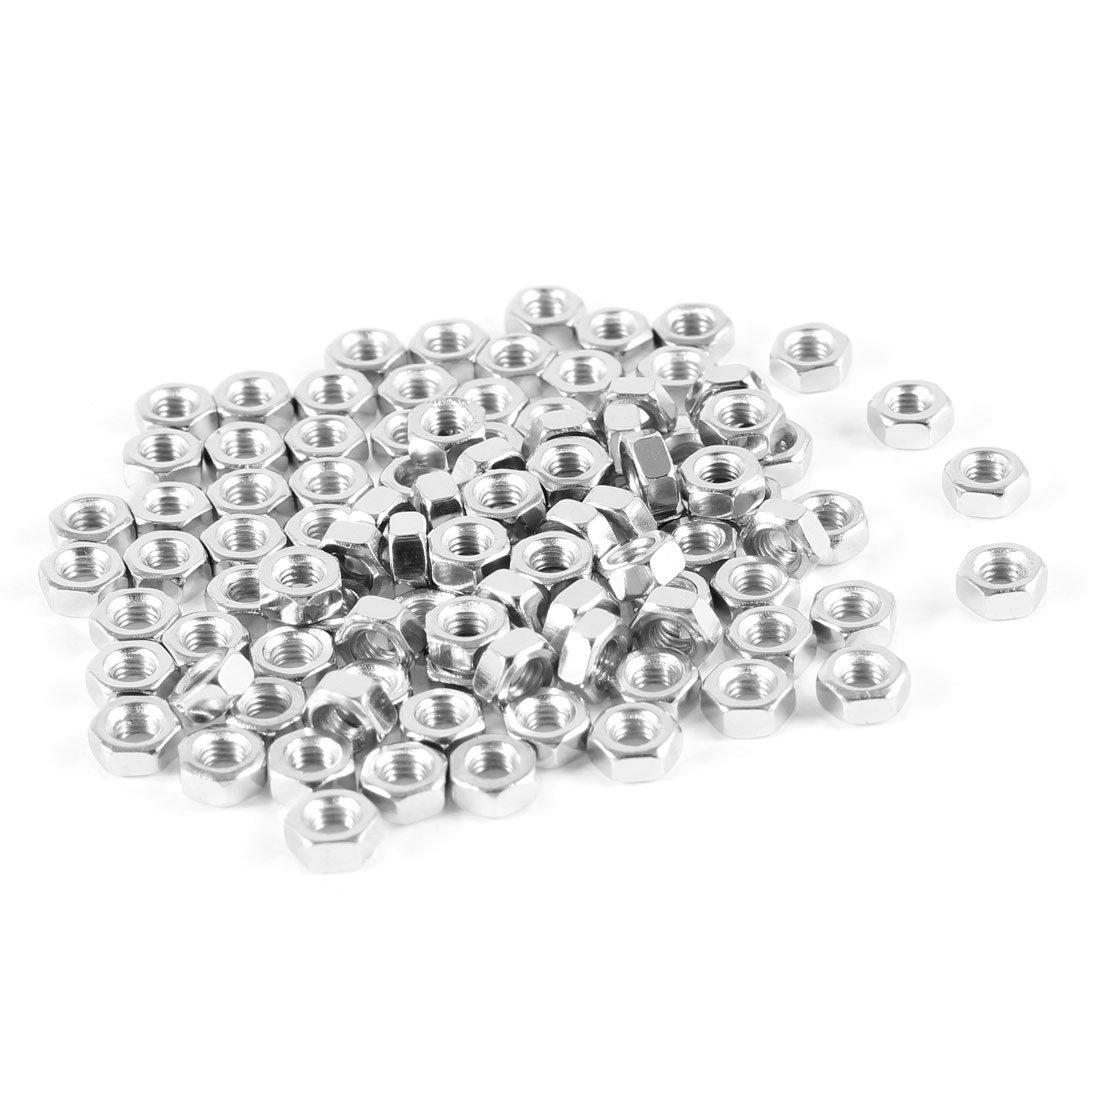 Sourcingmap a13092700ux0955 Tuercas hexagonales